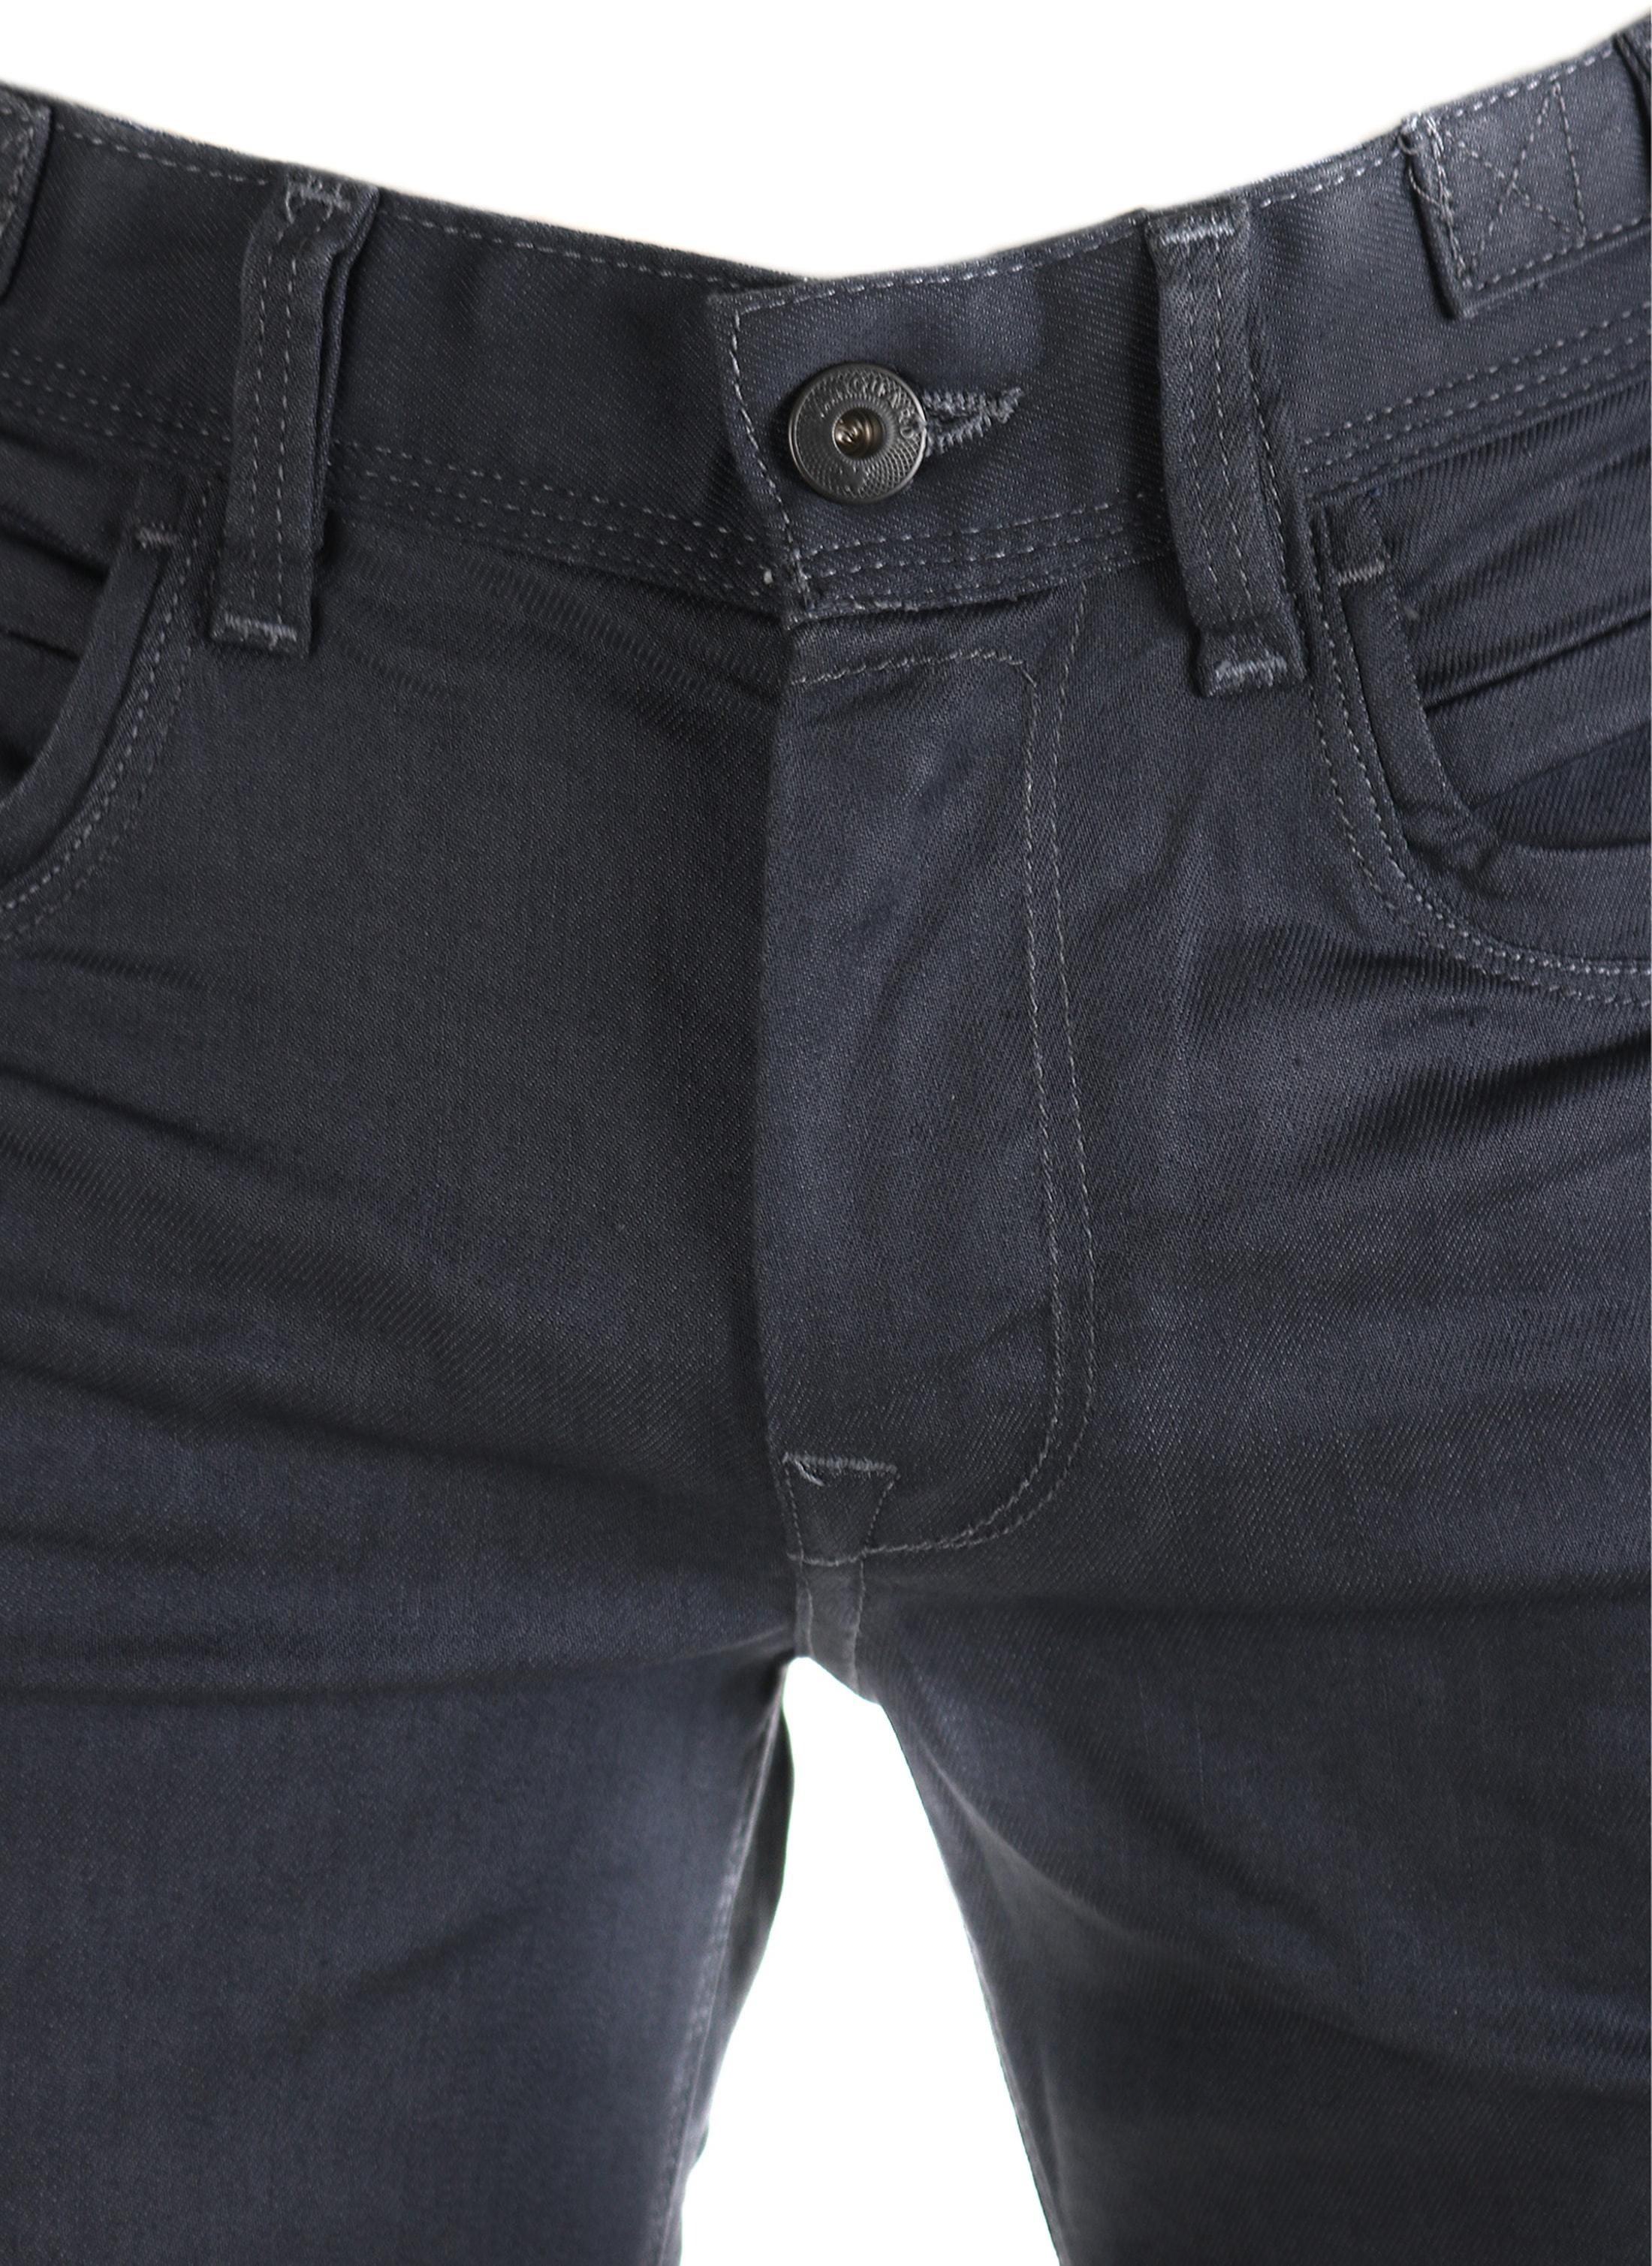 Vanguard V8 Jeans Dunkelgrau foto 2